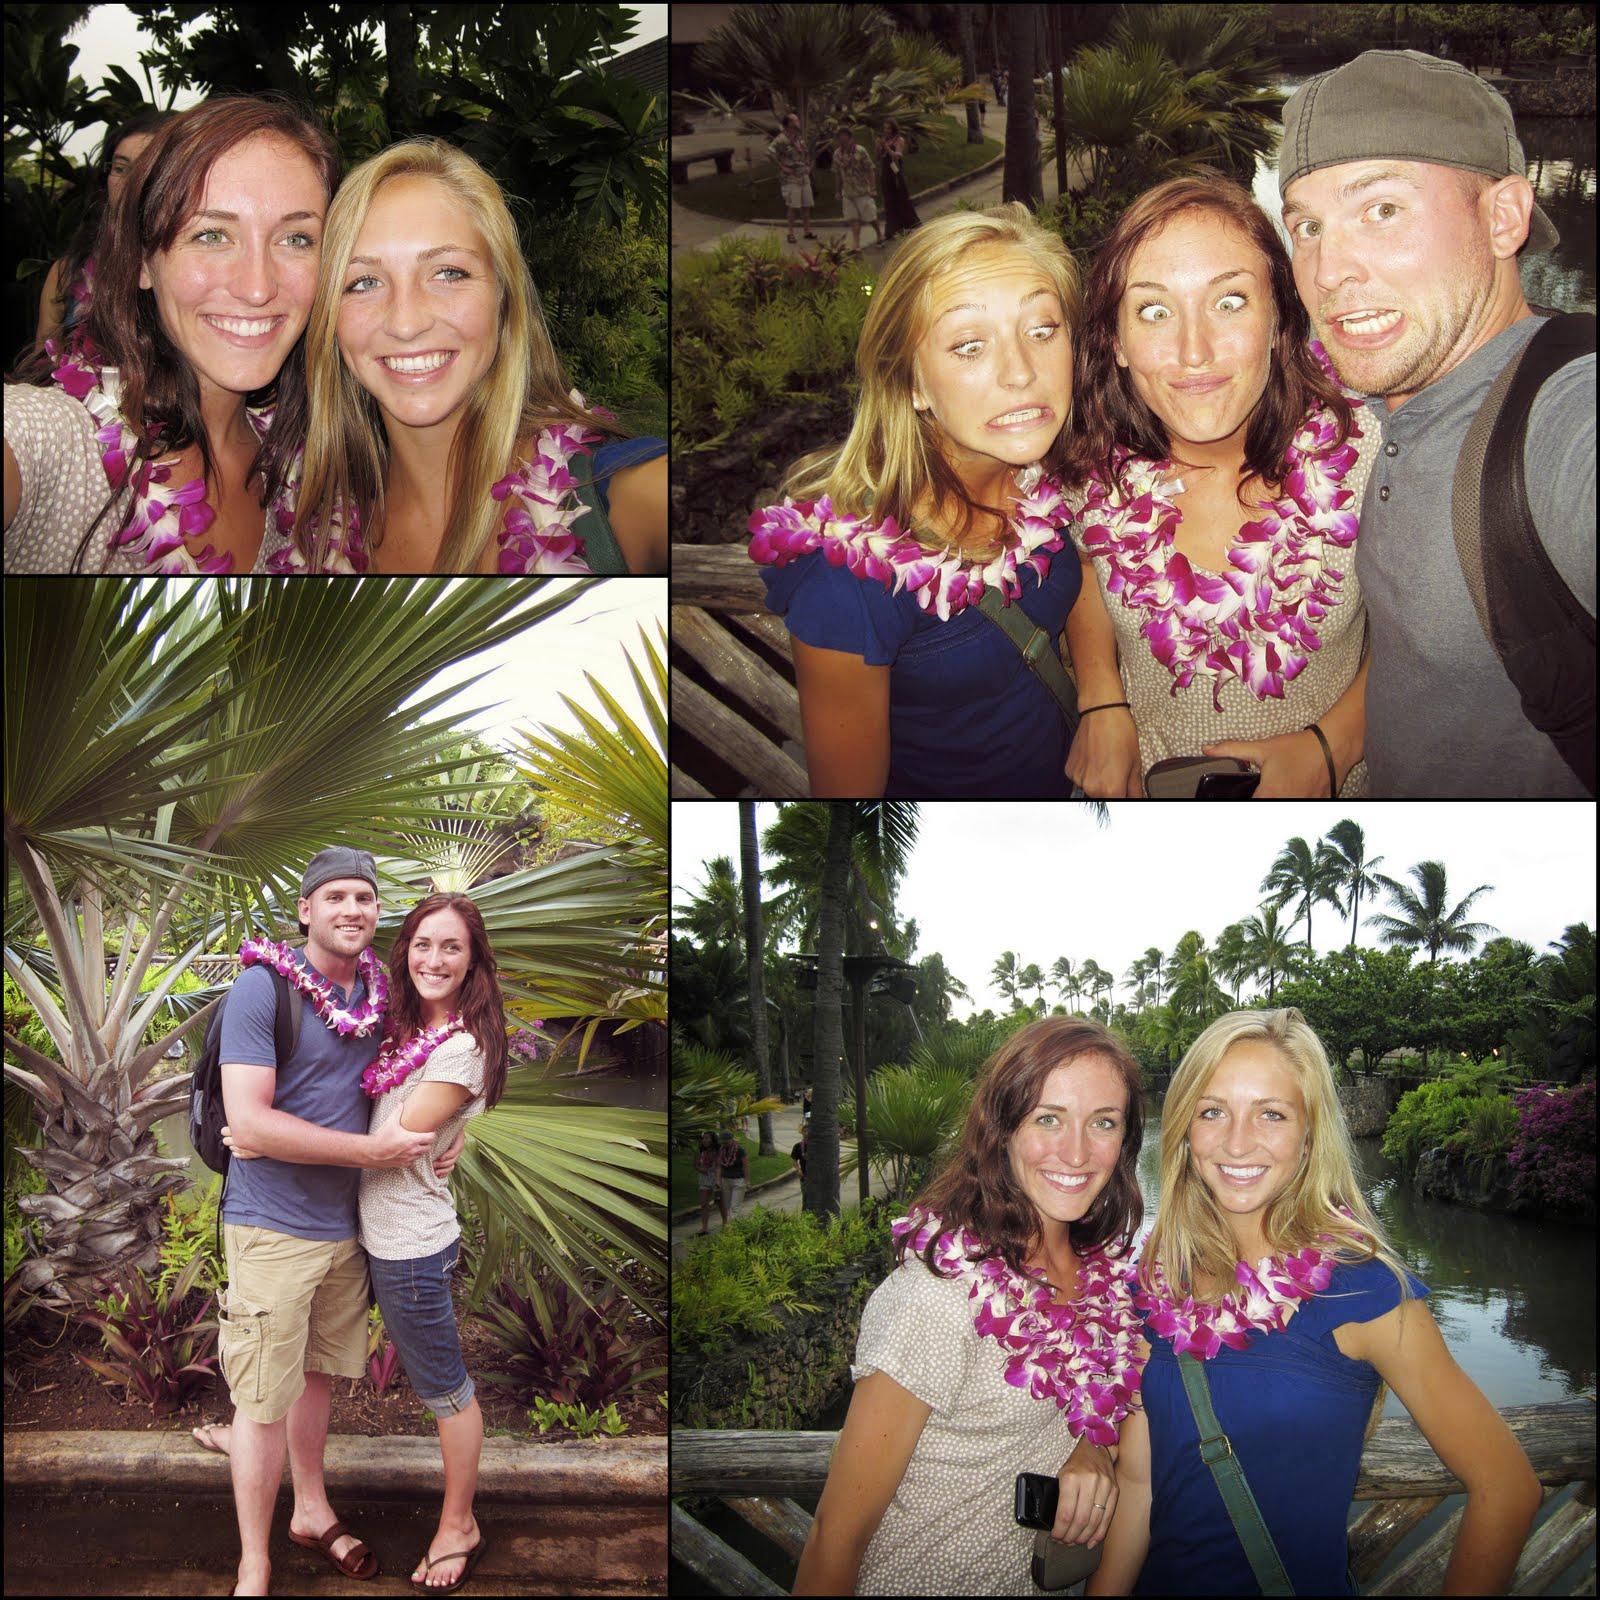 http://1.bp.blogspot.com/-31lq_6QJEAI/ThDG9vUgDFI/AAAAAAAAA0E/h3KynA0b3Dg/s1600/Hawaii2.jpg